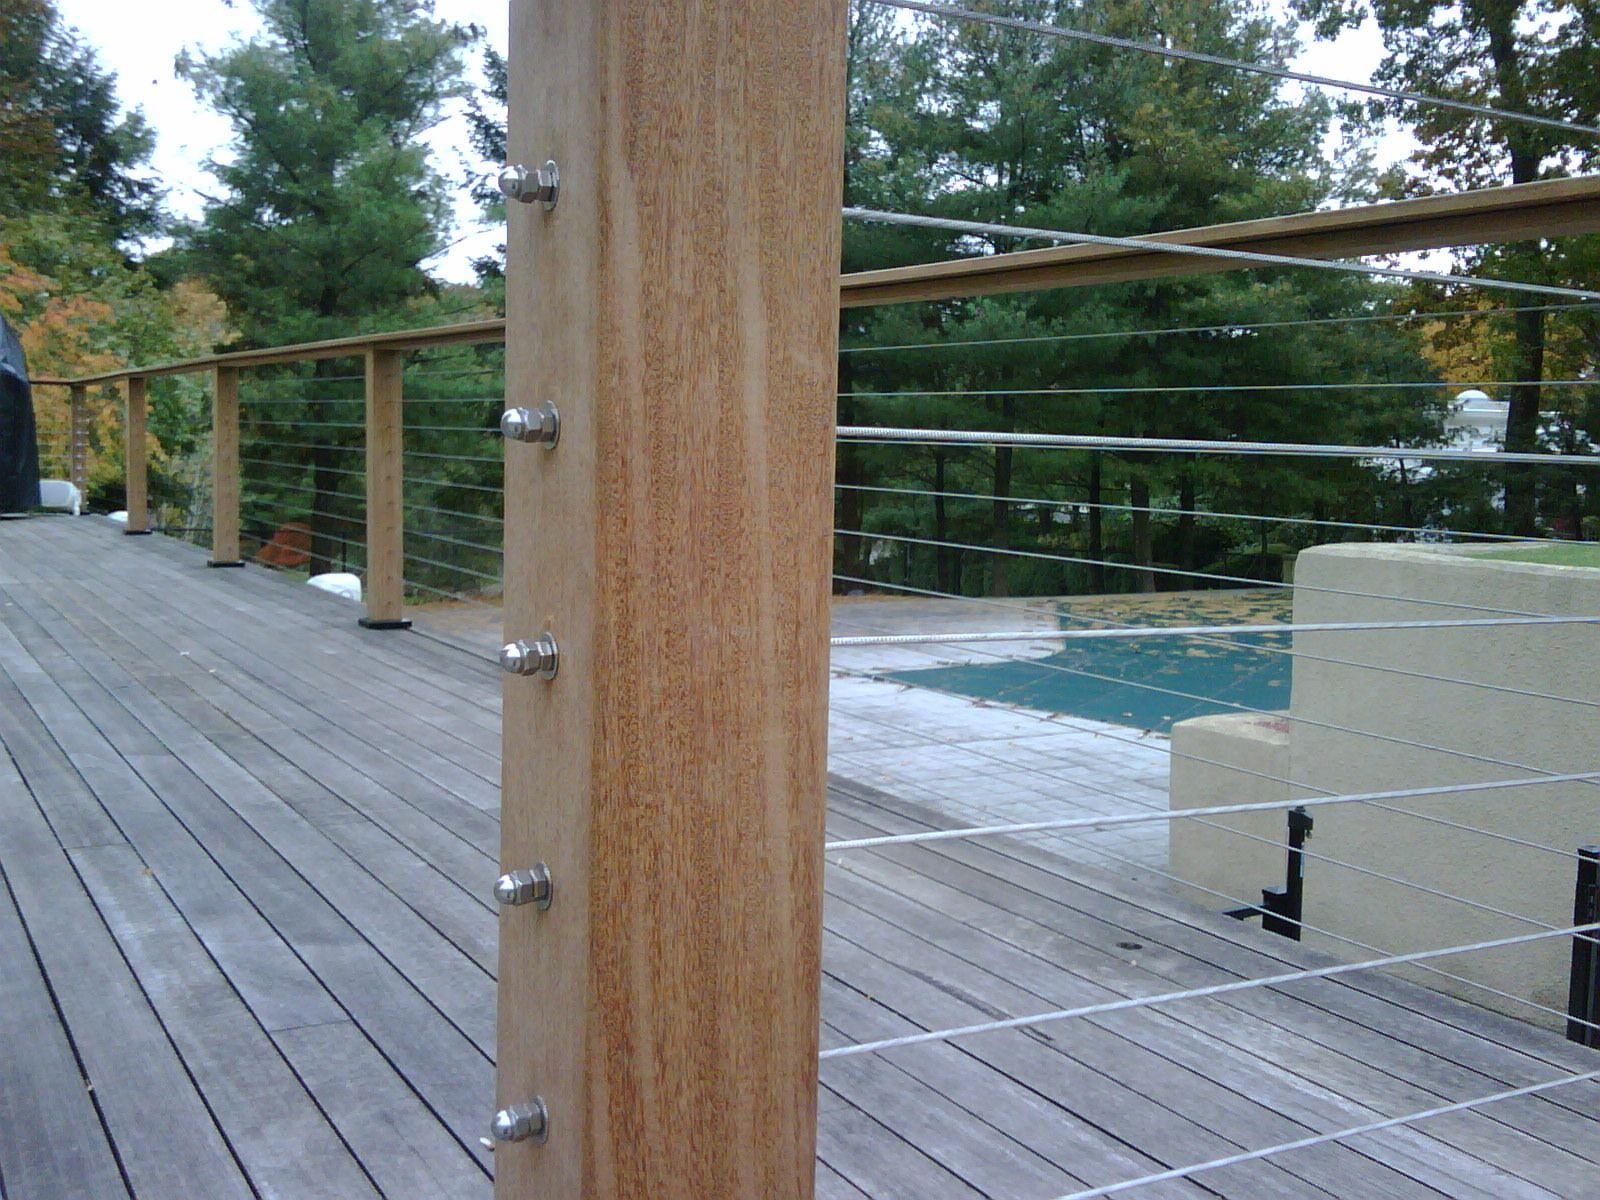 contemporary railings for decks and porches   and Porch Railings ...